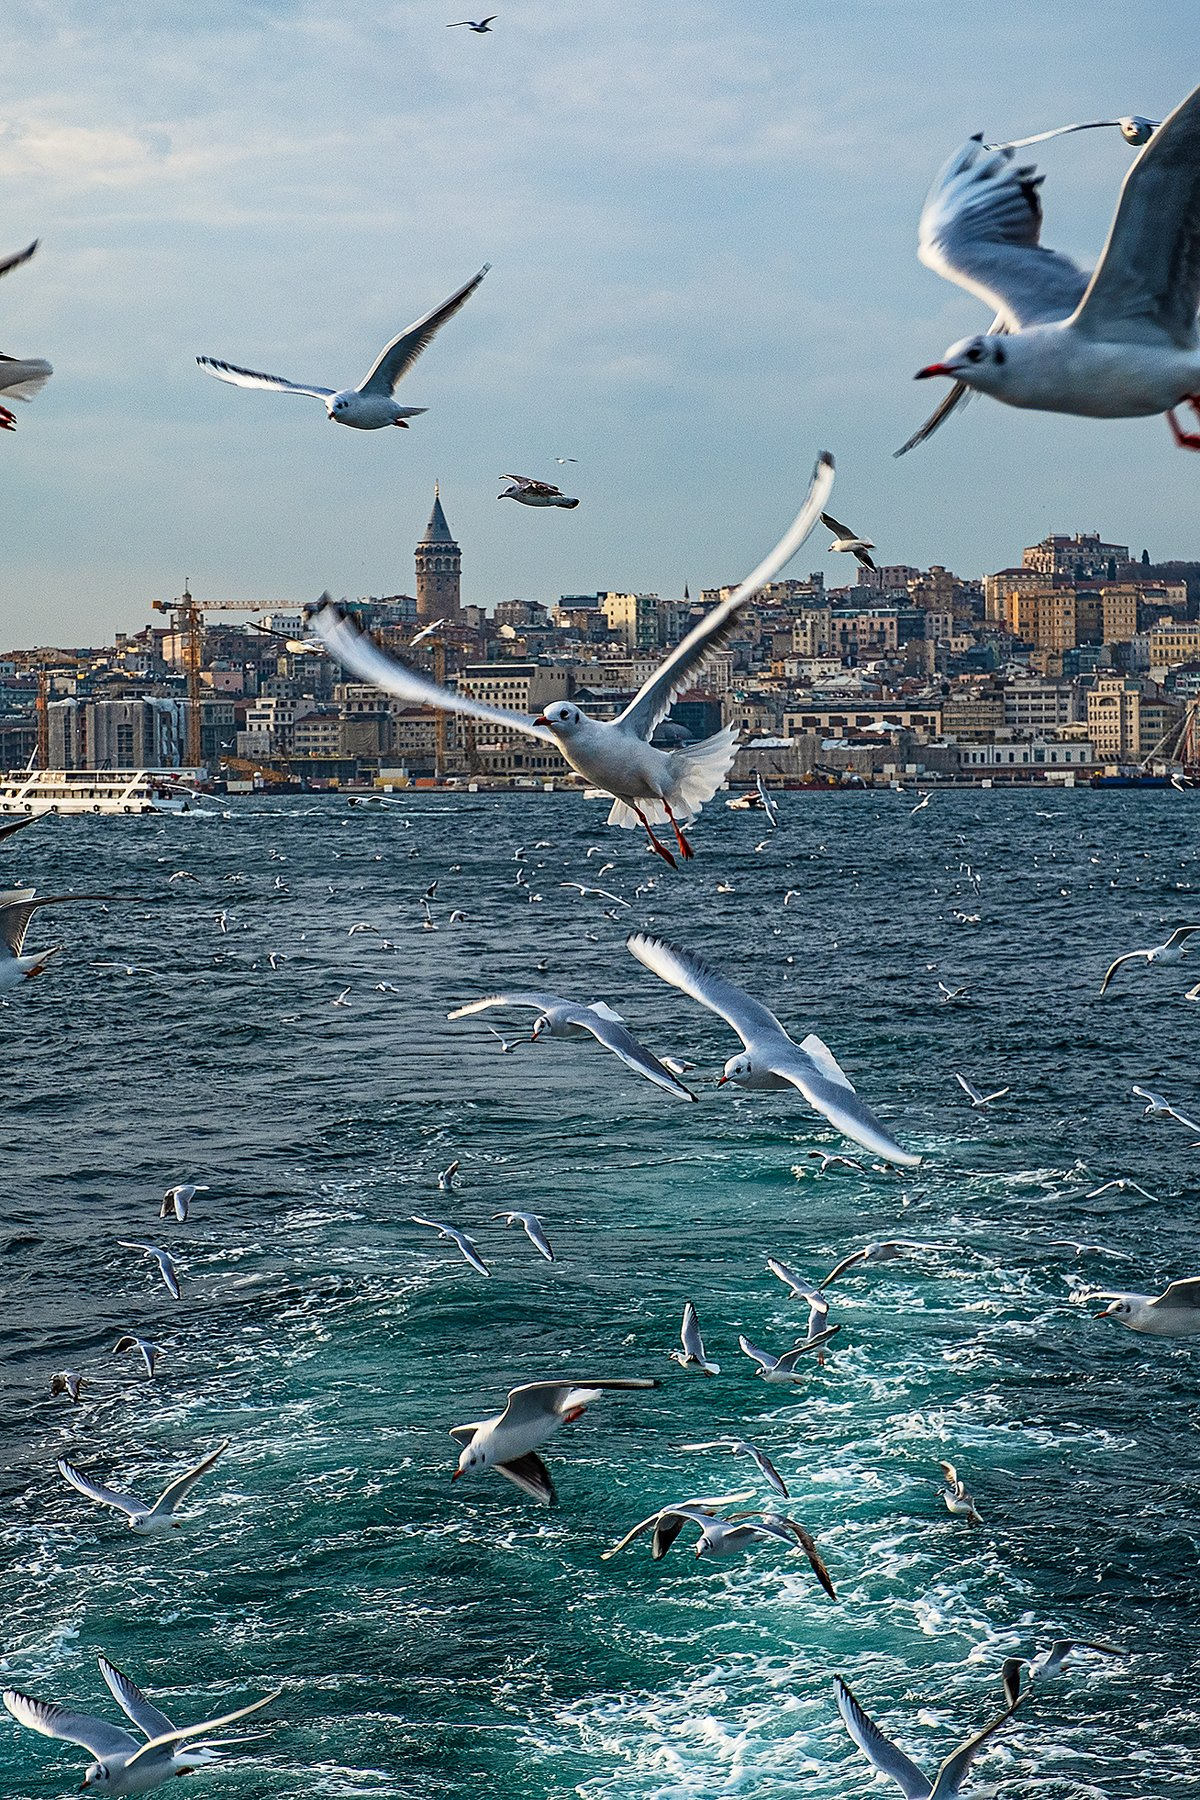 istanbul, bosphorus, seagull, turkey, стамбул, босфор, турция, чайка, Владимир В. Эделев